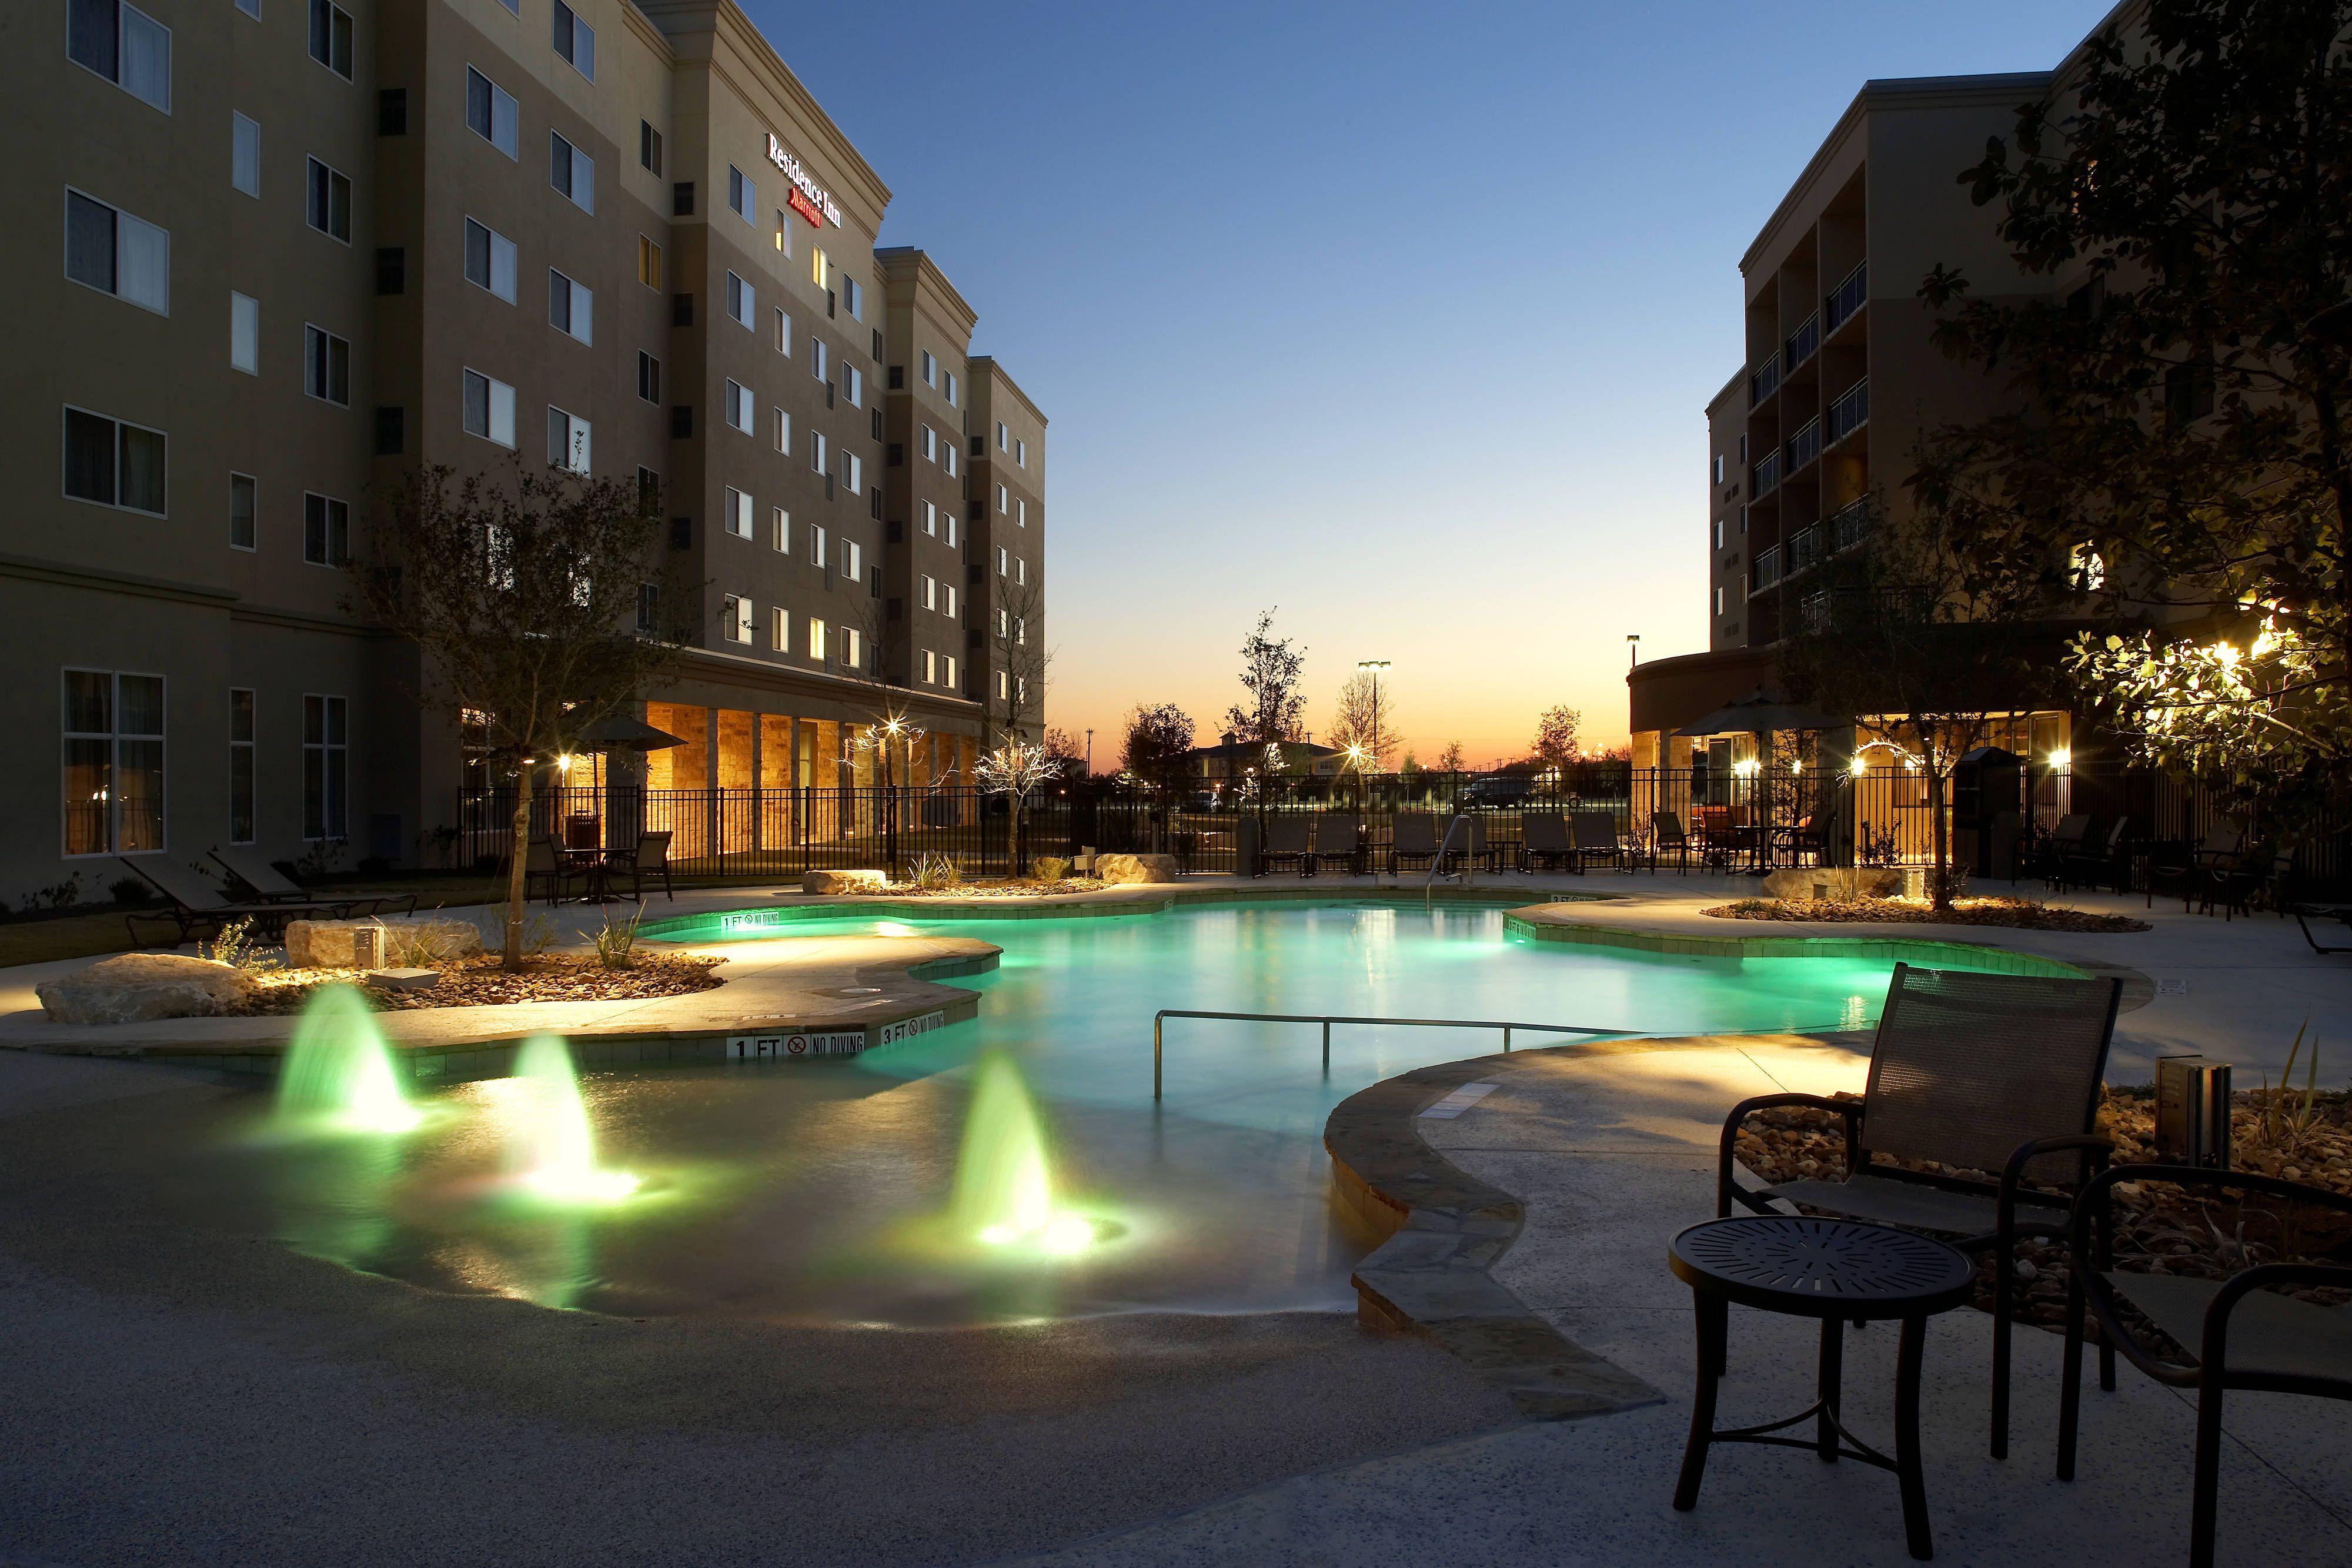 Residence Inn San Antonio Six Flags庐 At The Rim Outdoor Pool Happy Hotels Visiting